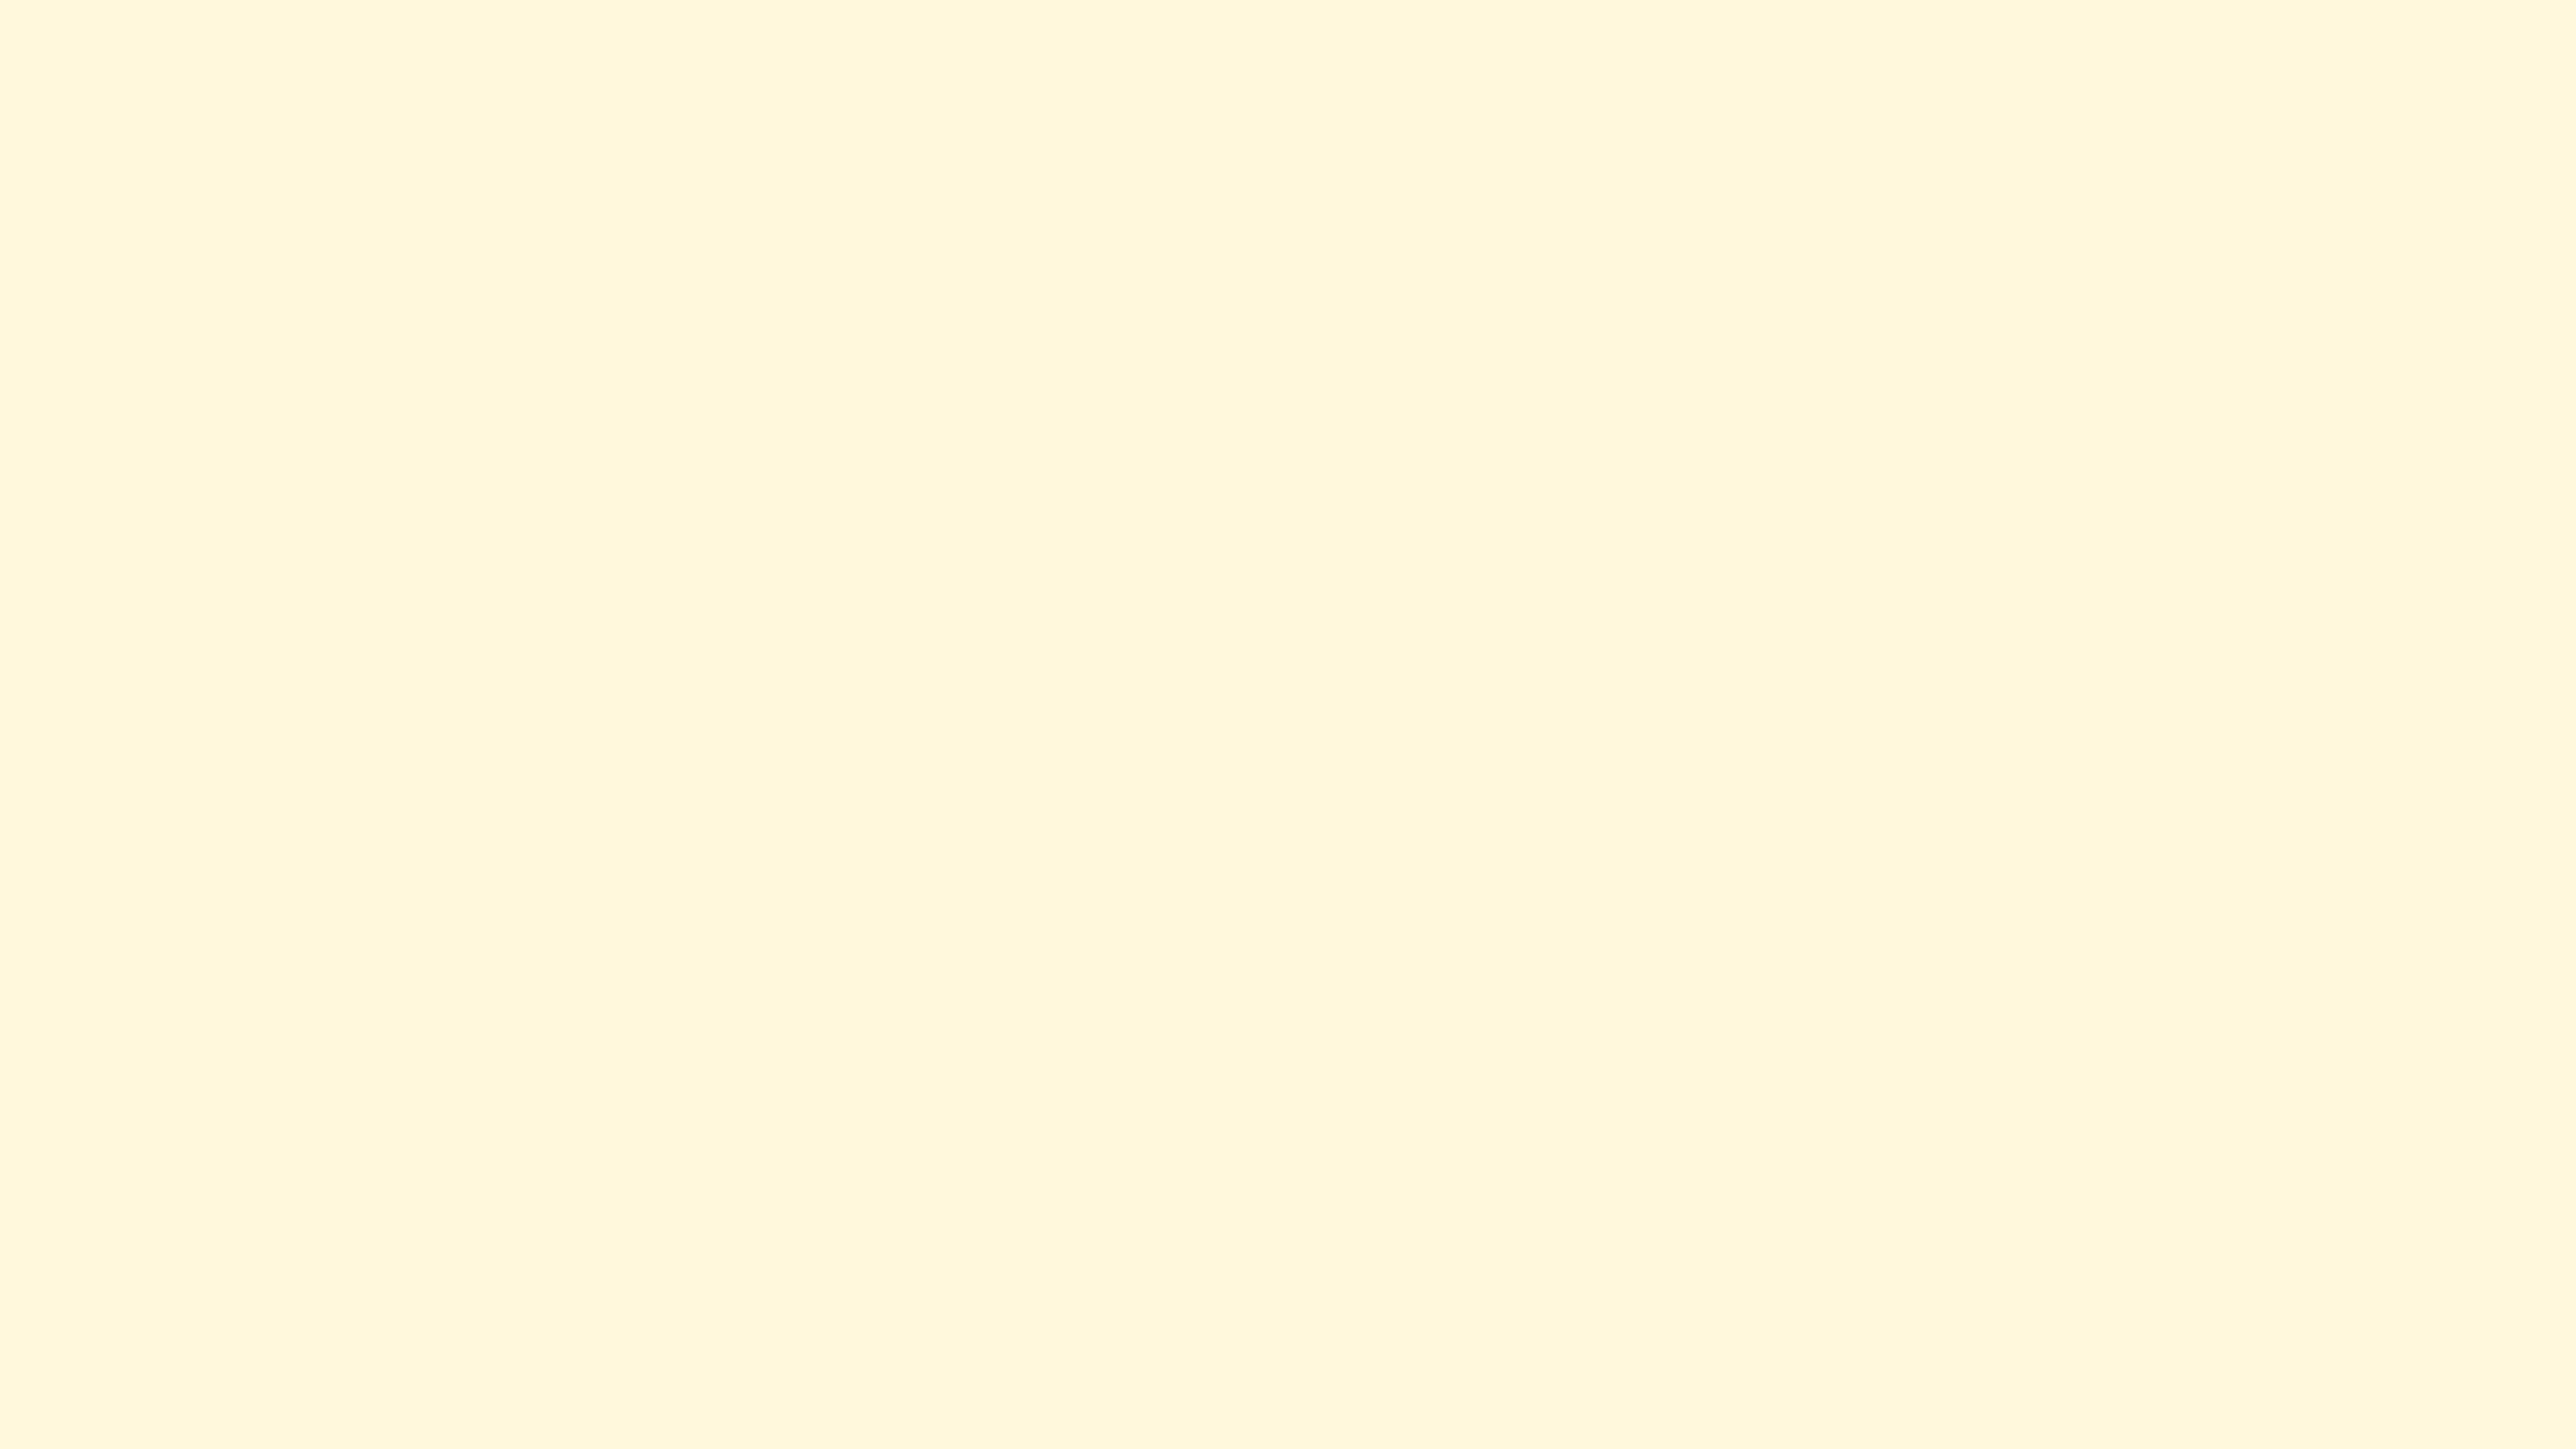 4096x2304 Cornsilk Solid Color Background